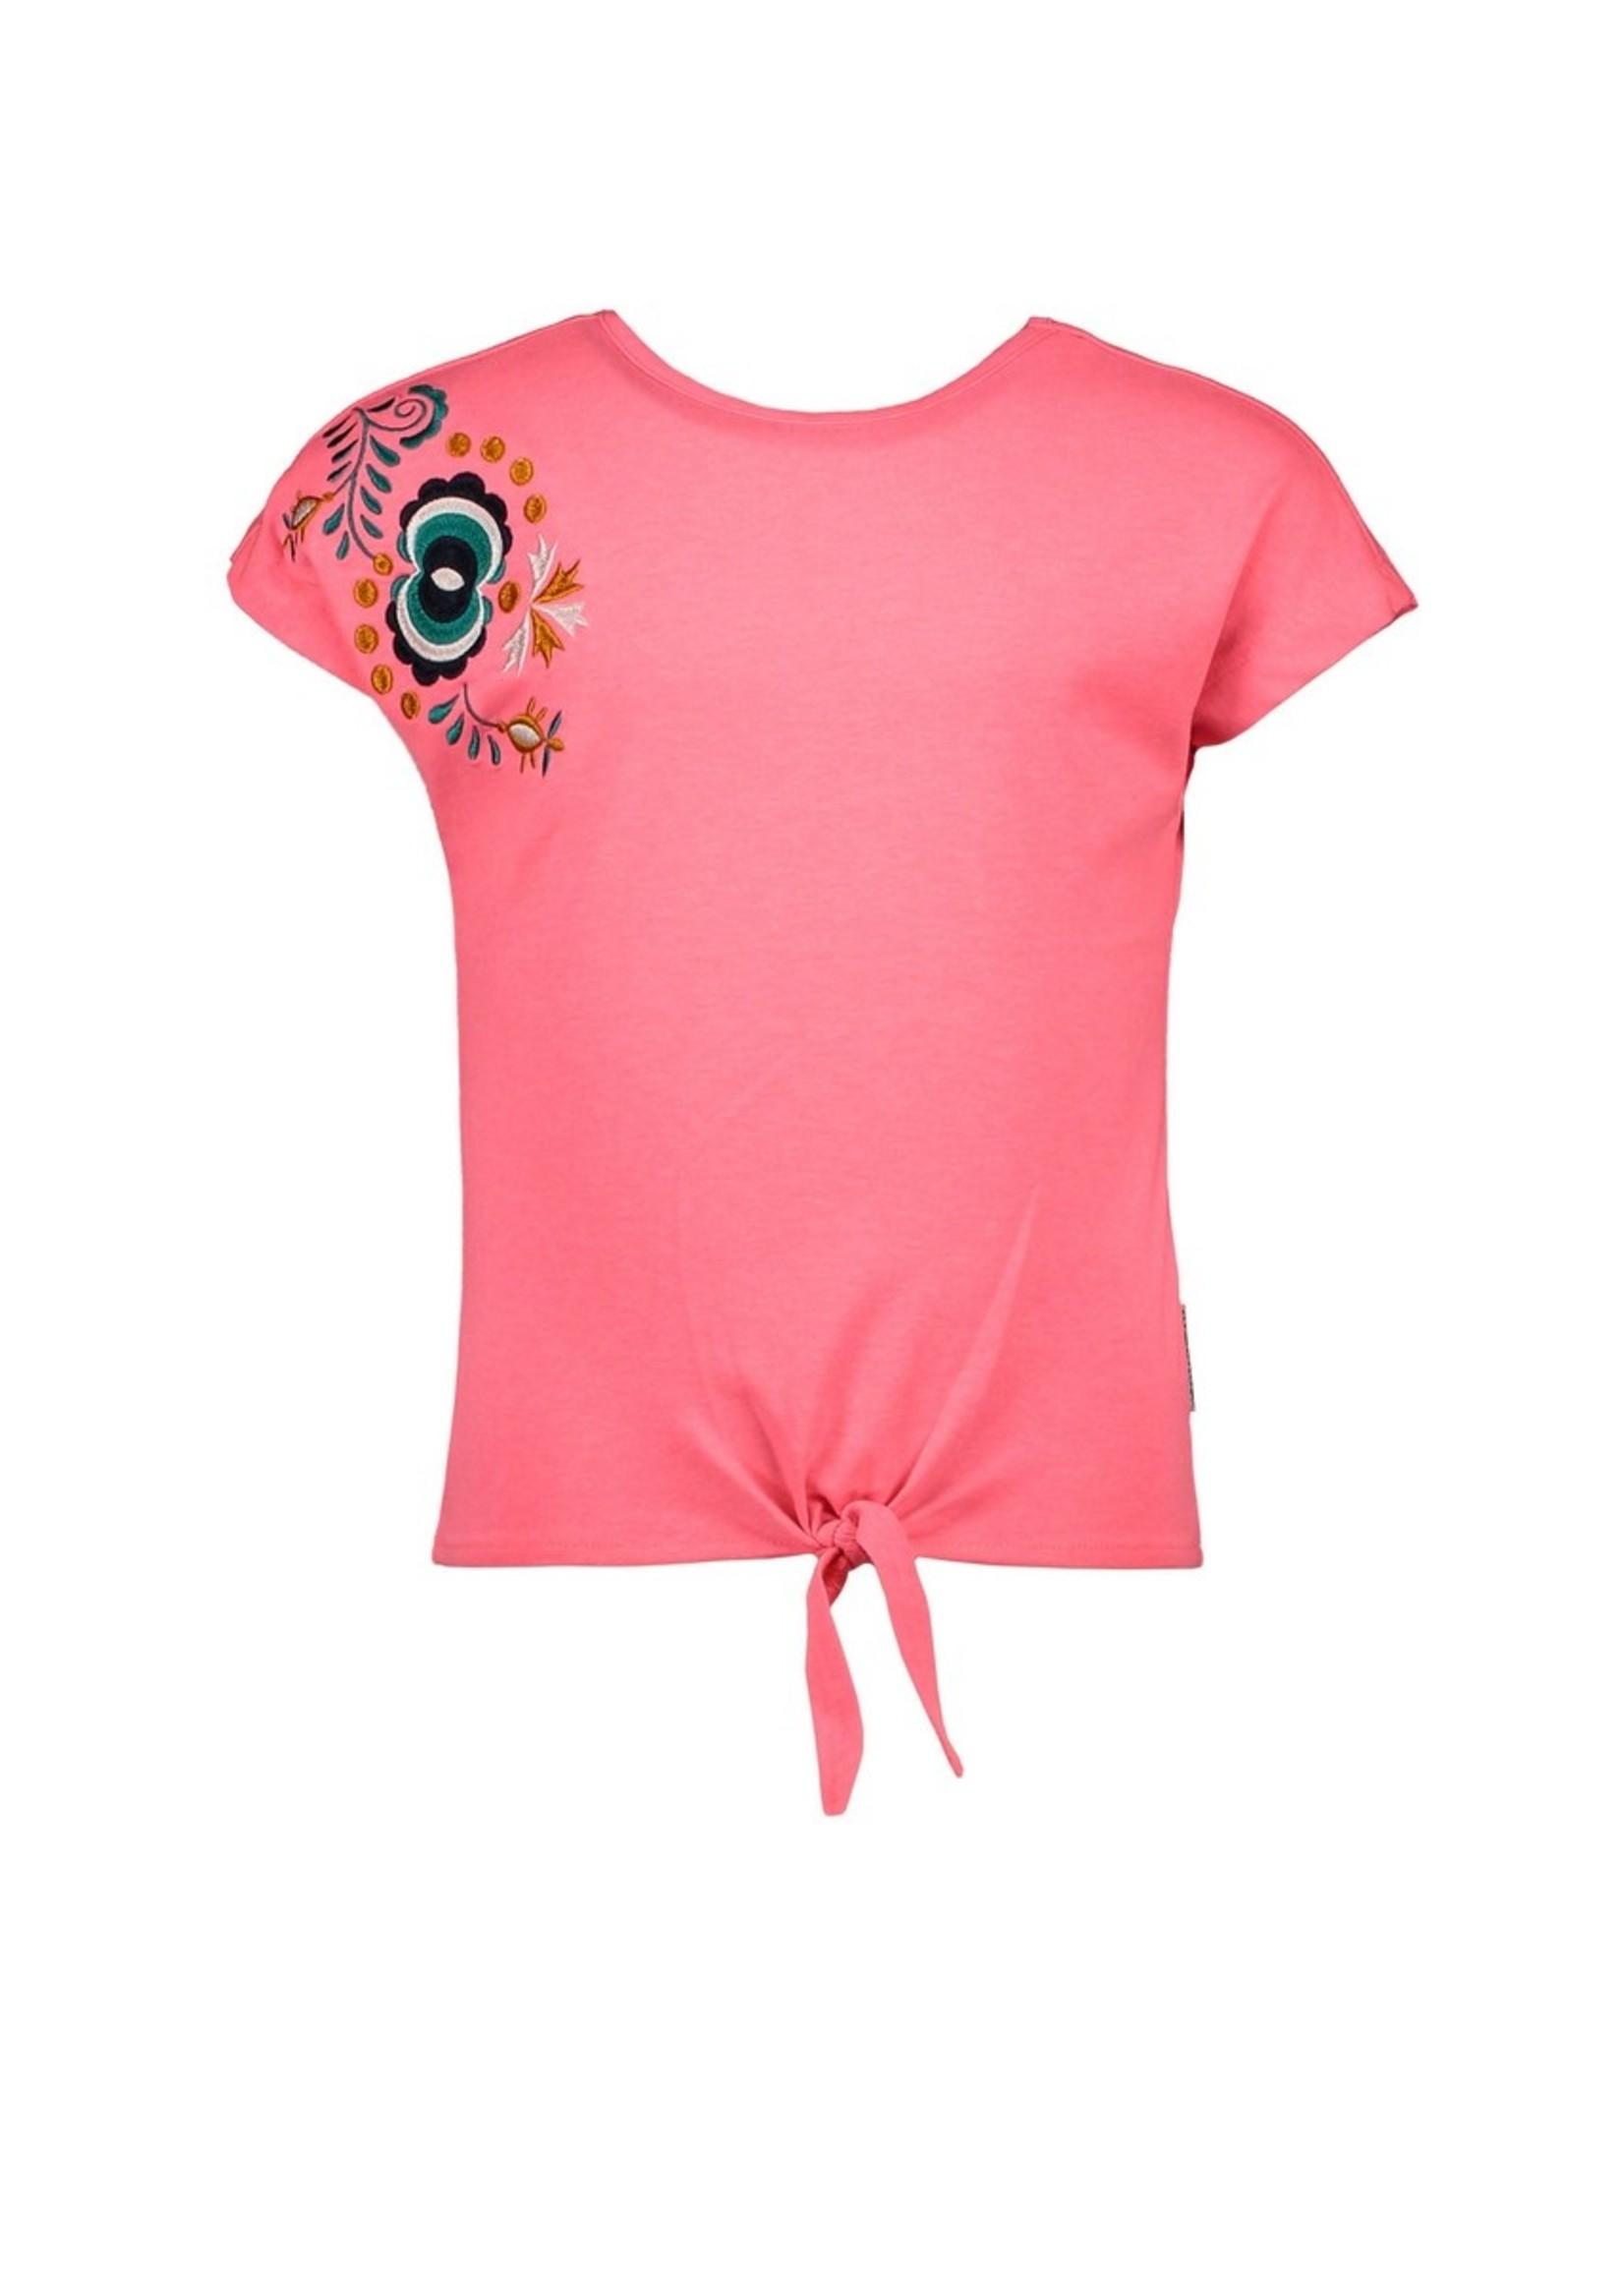 B.nosy Shirt Festival Pink